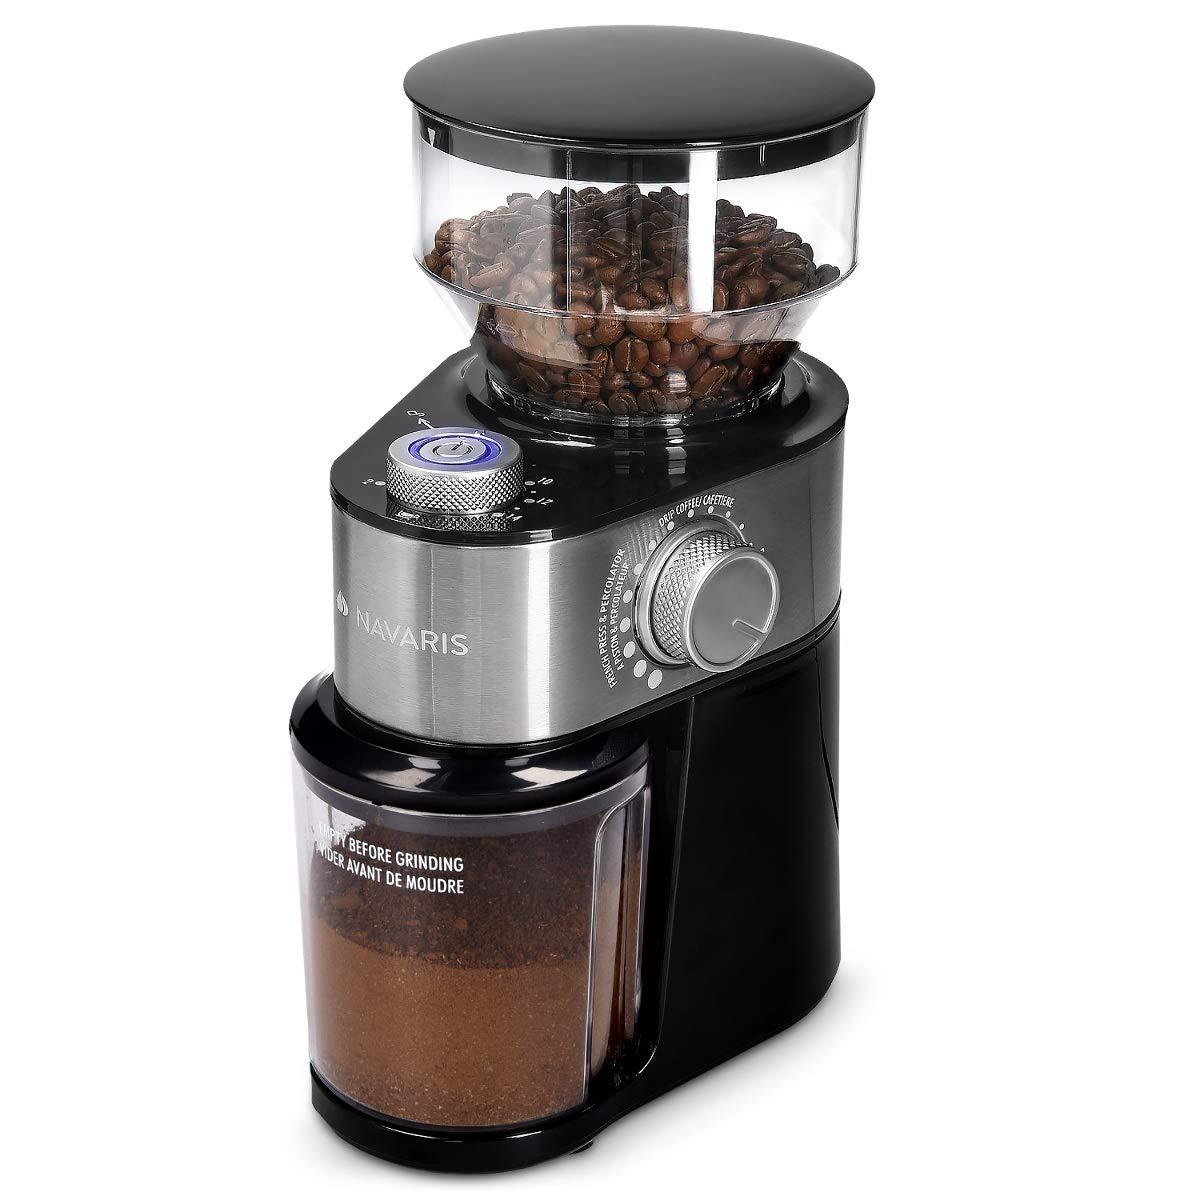 Navaris Molinillo de café eléctrico - Molino Regulable de Granos ...